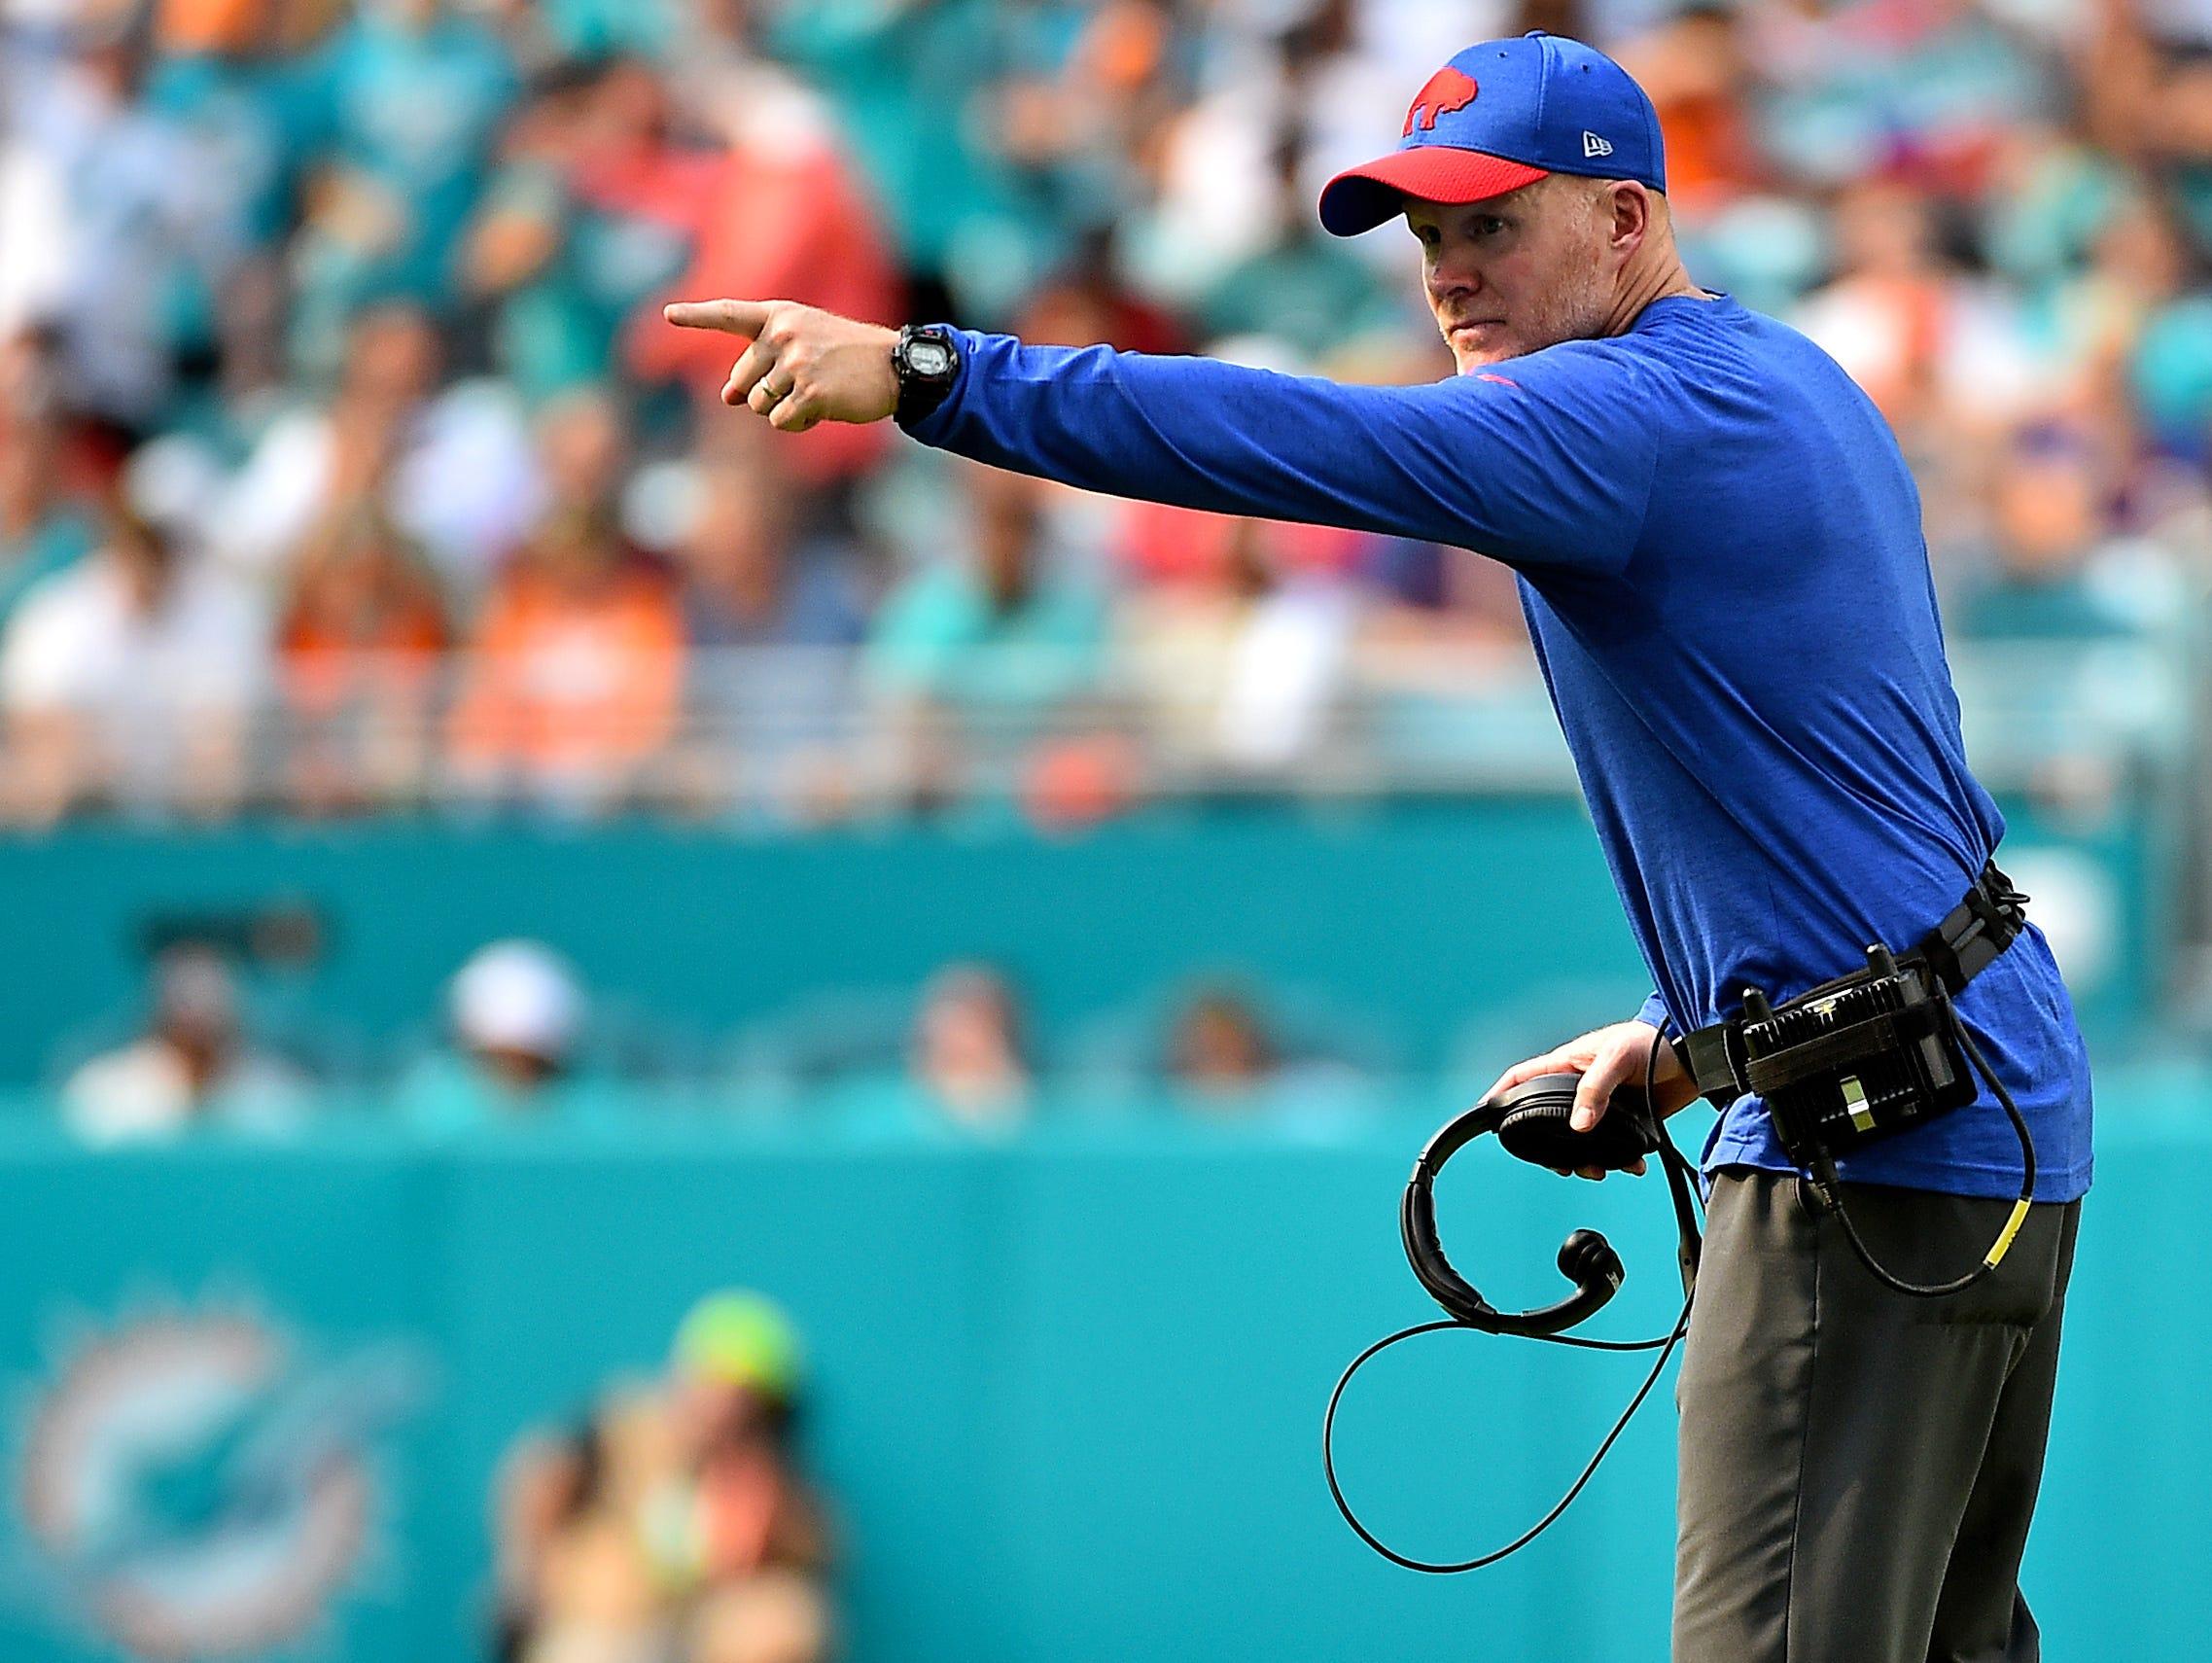 Dec 2, 2018; Miami Gardens, FL, USA; Buffalo Bills head coach Sean McDermott gestures during the first half against the Miami Dolphins at Hard Rock Stadium. Mandatory Credit: Jasen Vinlove-USA TODAY Sports